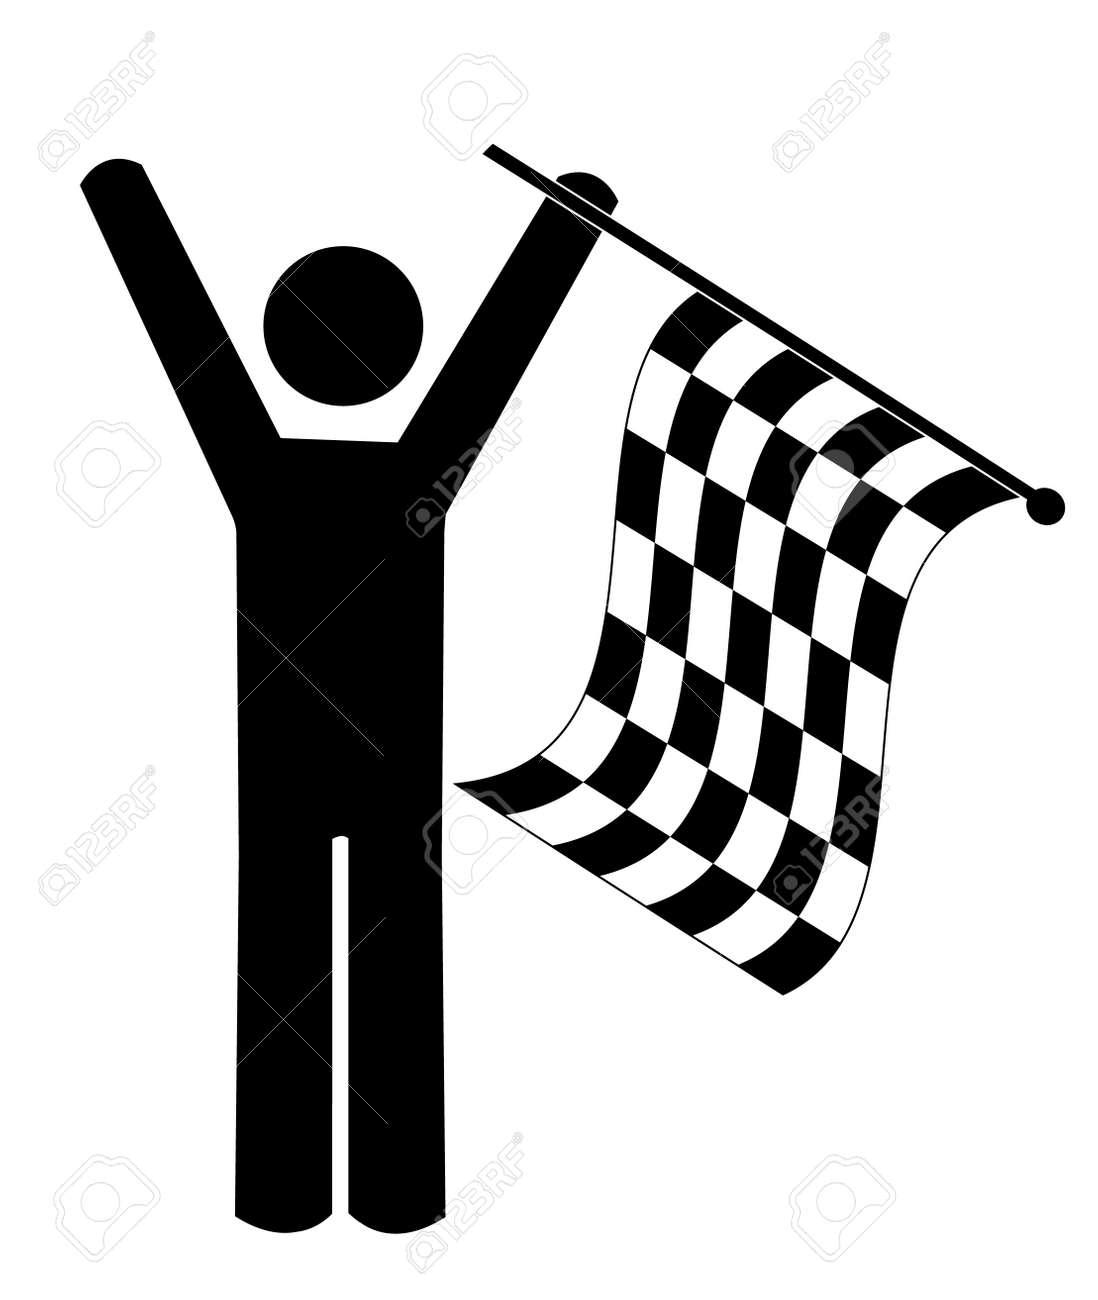 stick man or figure waving checkered flag - winner - vector Stock Vector - 3123101